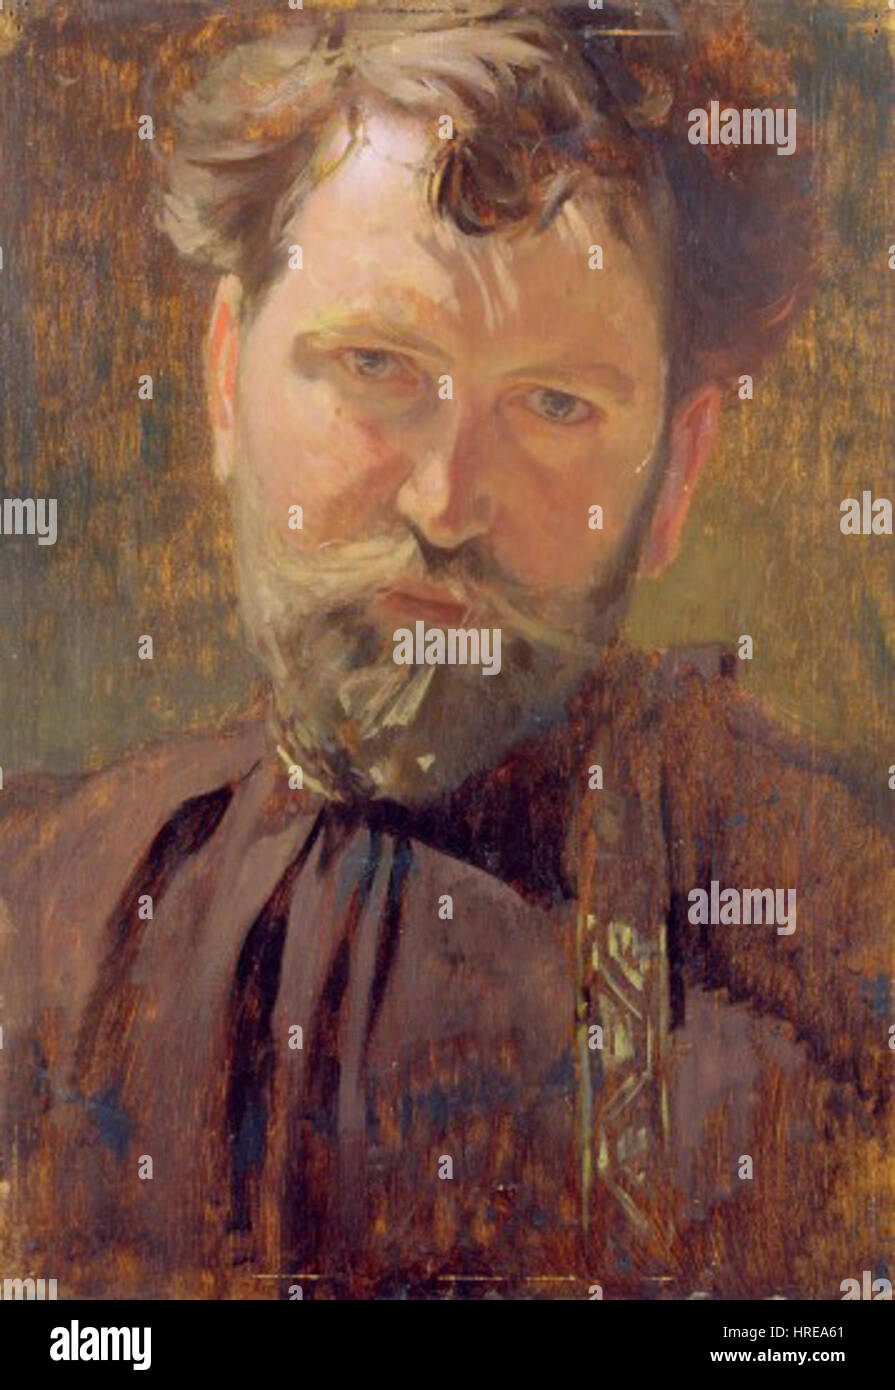 Alfons Mucha Self Portrait - Stock Image